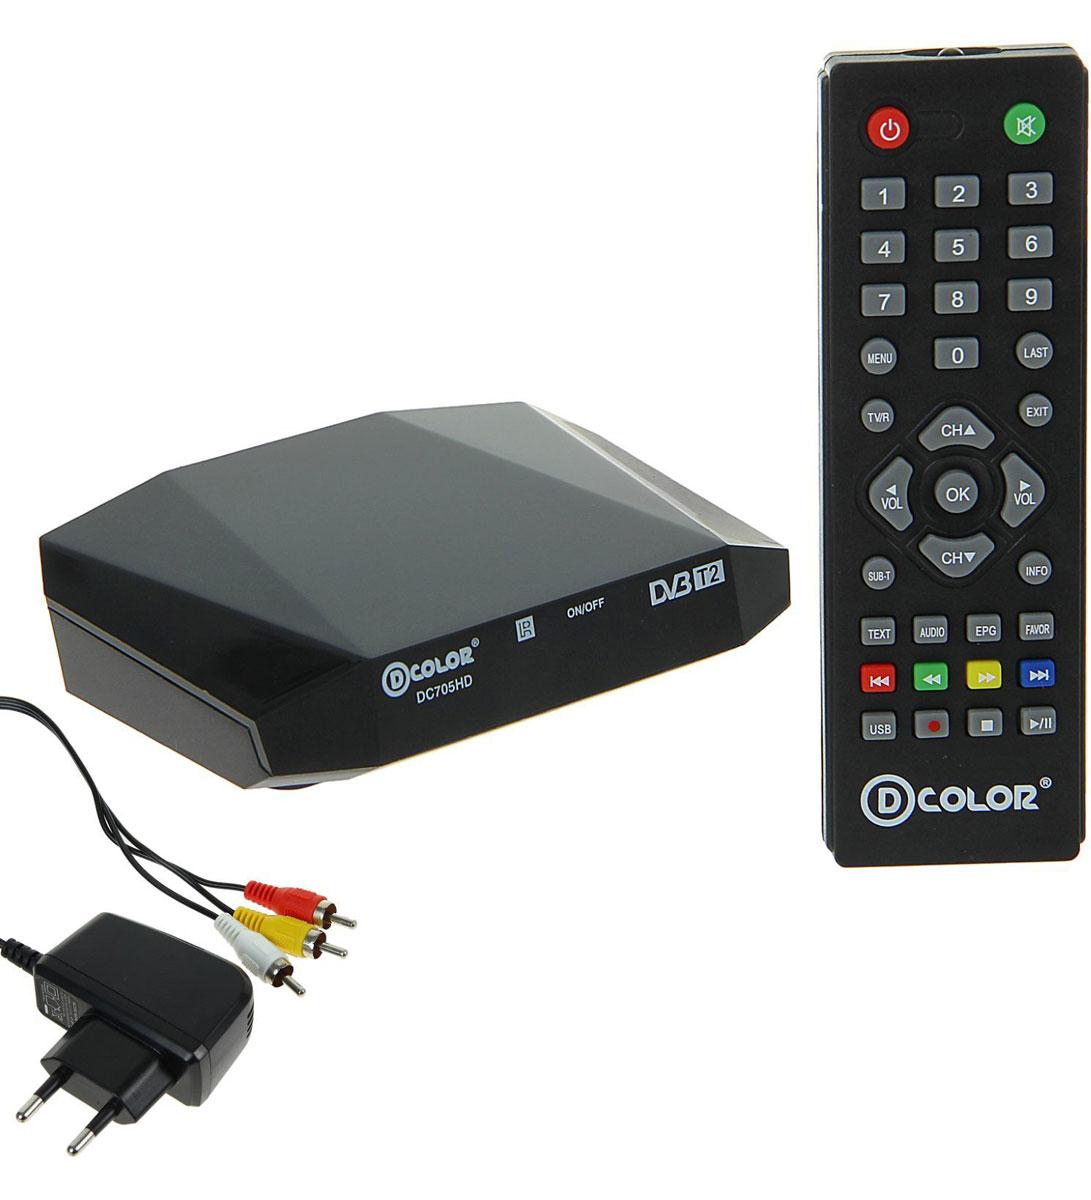 D-Color DC705HD DVB-T2 цифровой ТВ-тюнер d color dc700hd dvb t2 цифровой тв тюнер